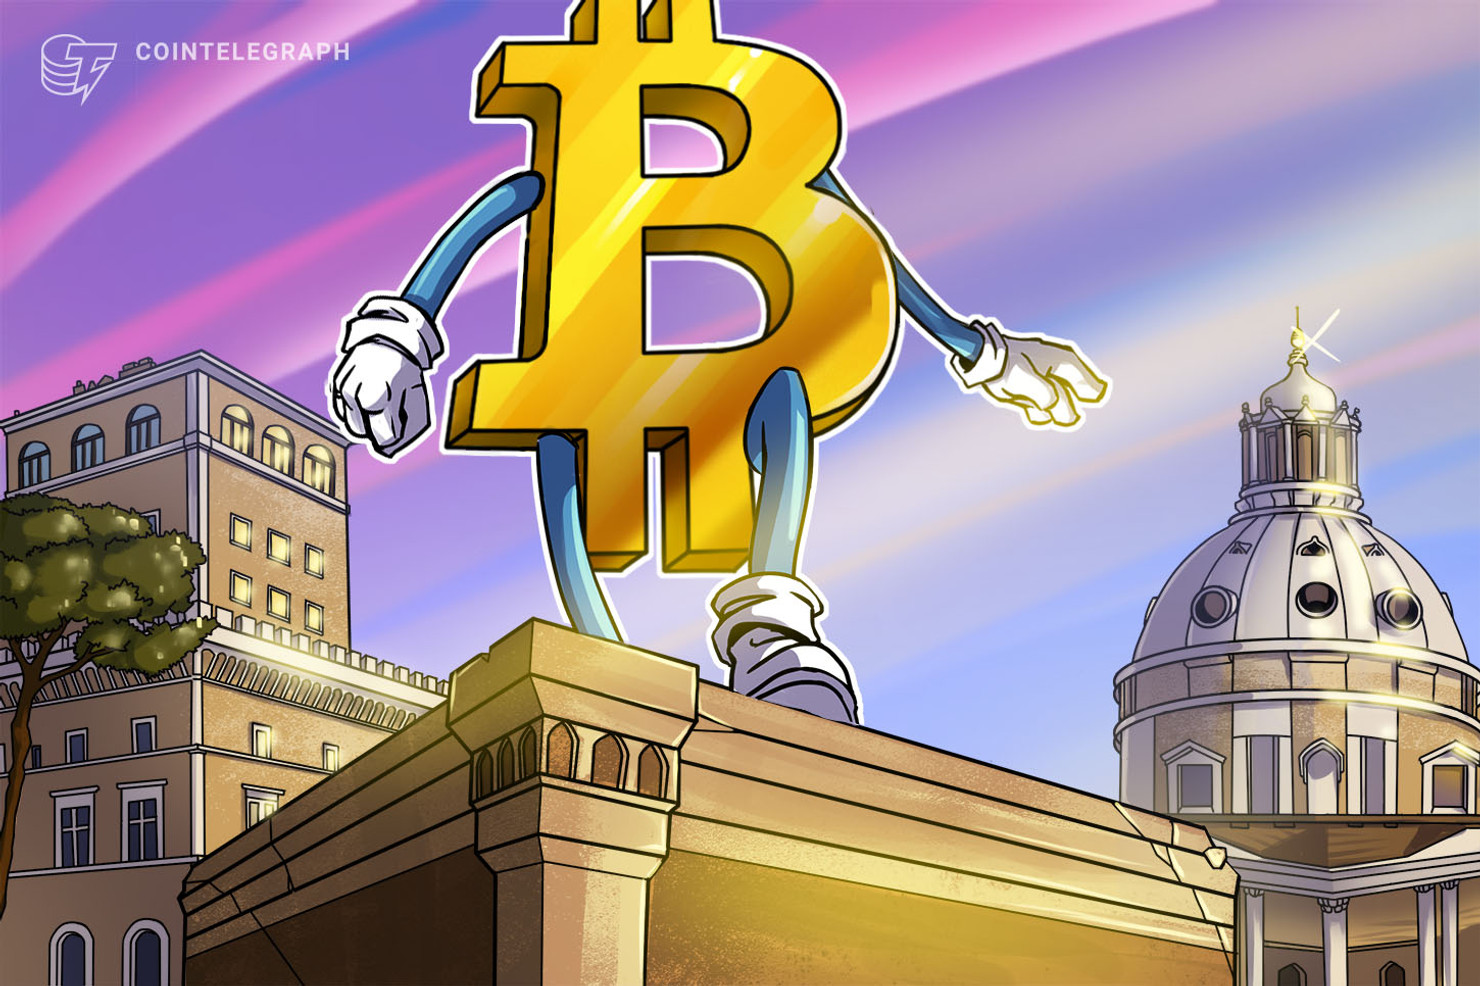 Italian Bank Opens Bitcoin Trading to 1.2 Million During Lockdown